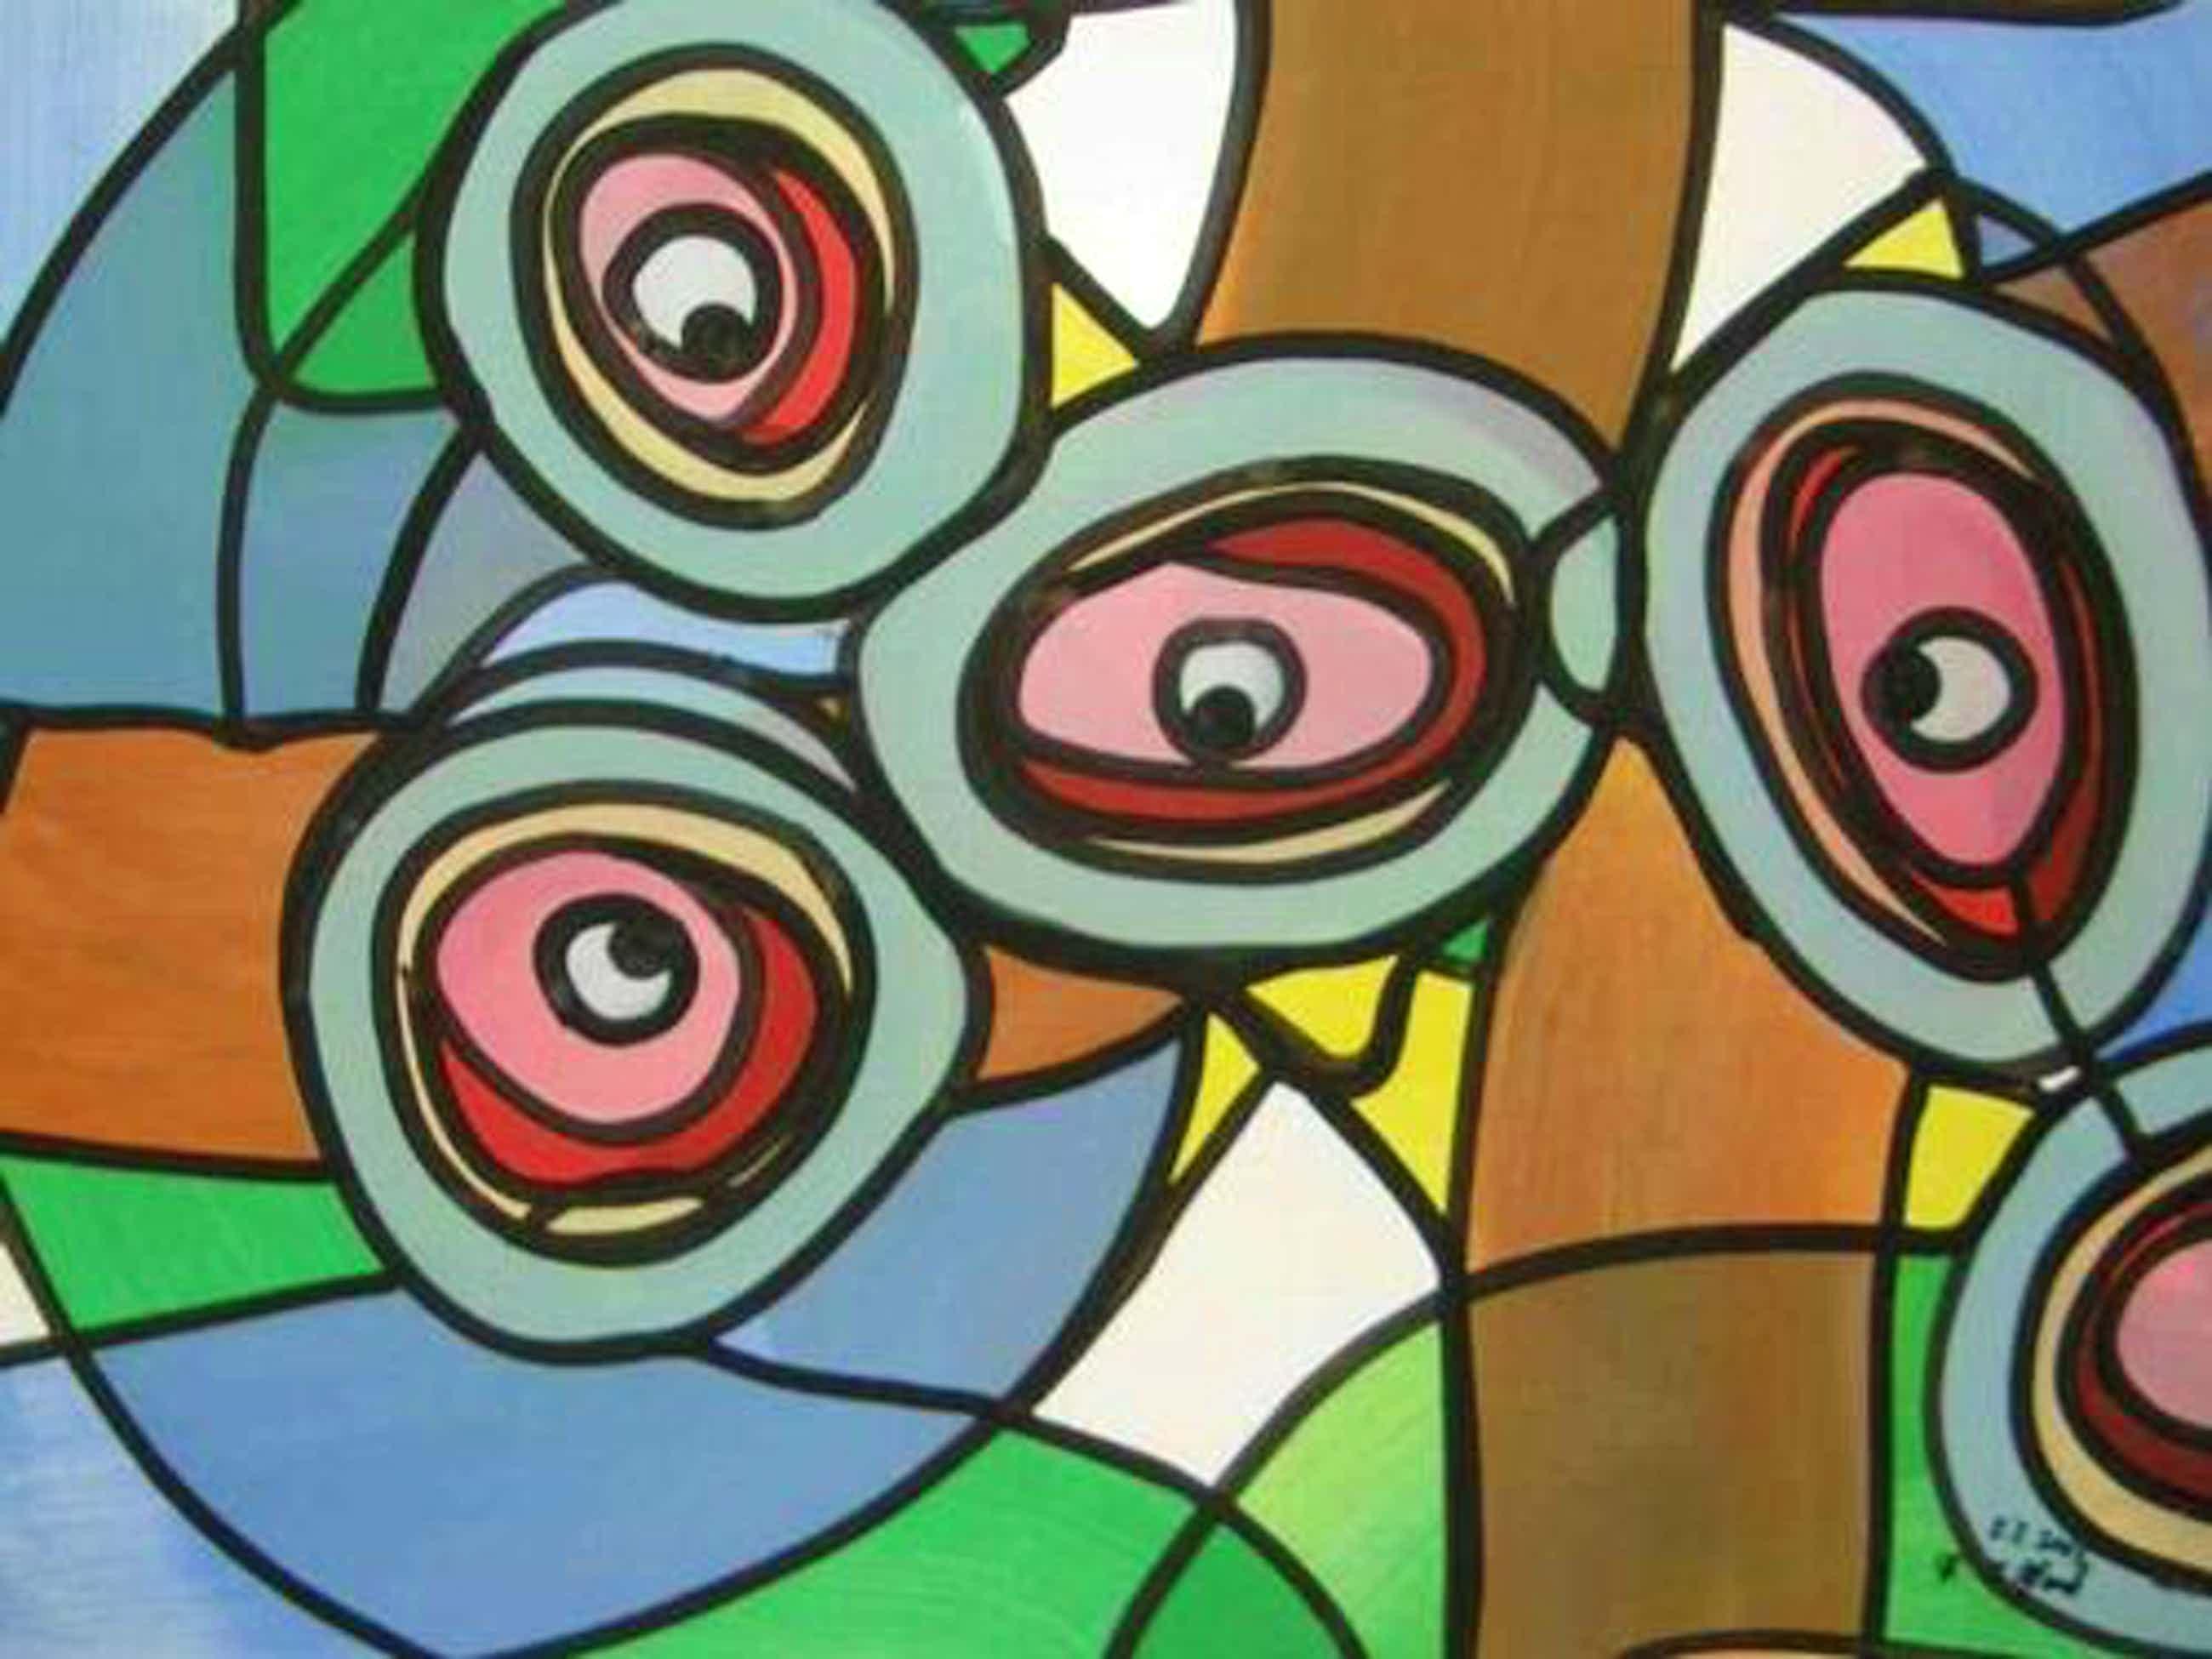 Franz J. Blank - AUGENSCHMAUS - Grosse POP-ART Acrylmalerei - Handsigniert 2003 (Extravaganza Florida VISIONEN 2000) kopen? Bied vanaf 99!